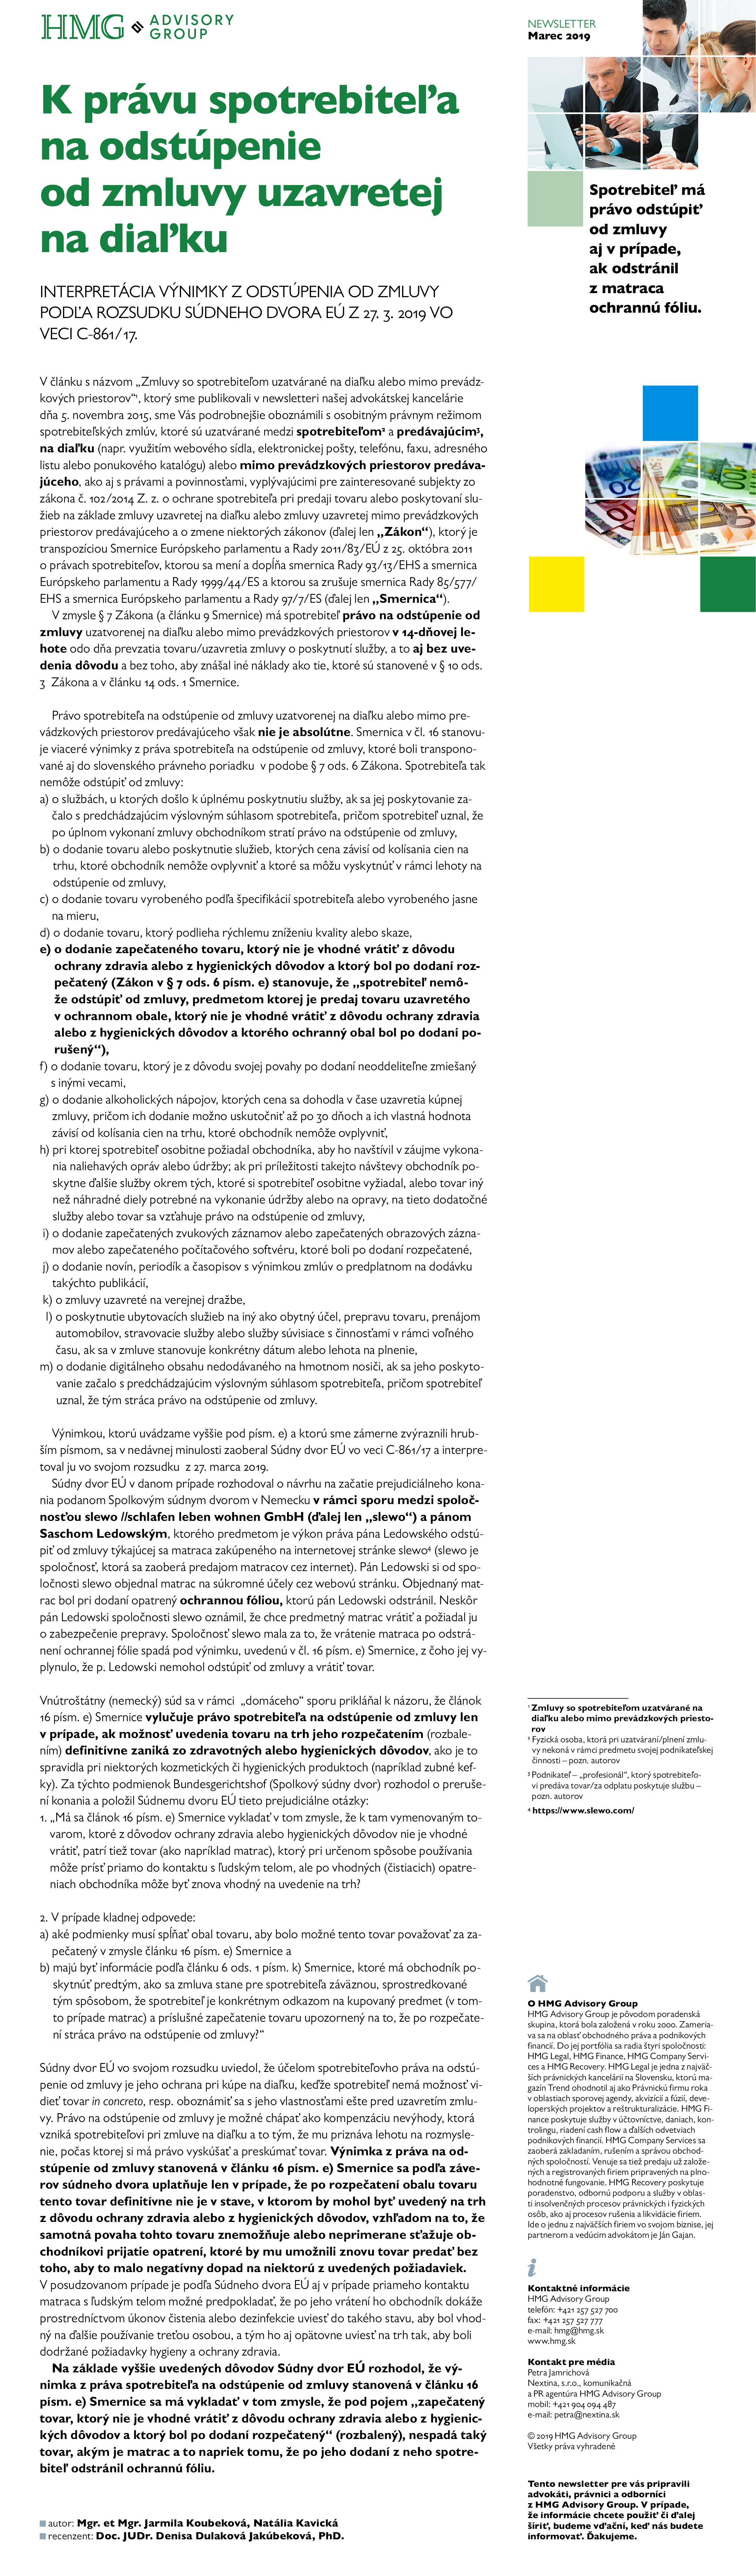 HMG_newsletter_odstúpenie  od zmluvy.jpg